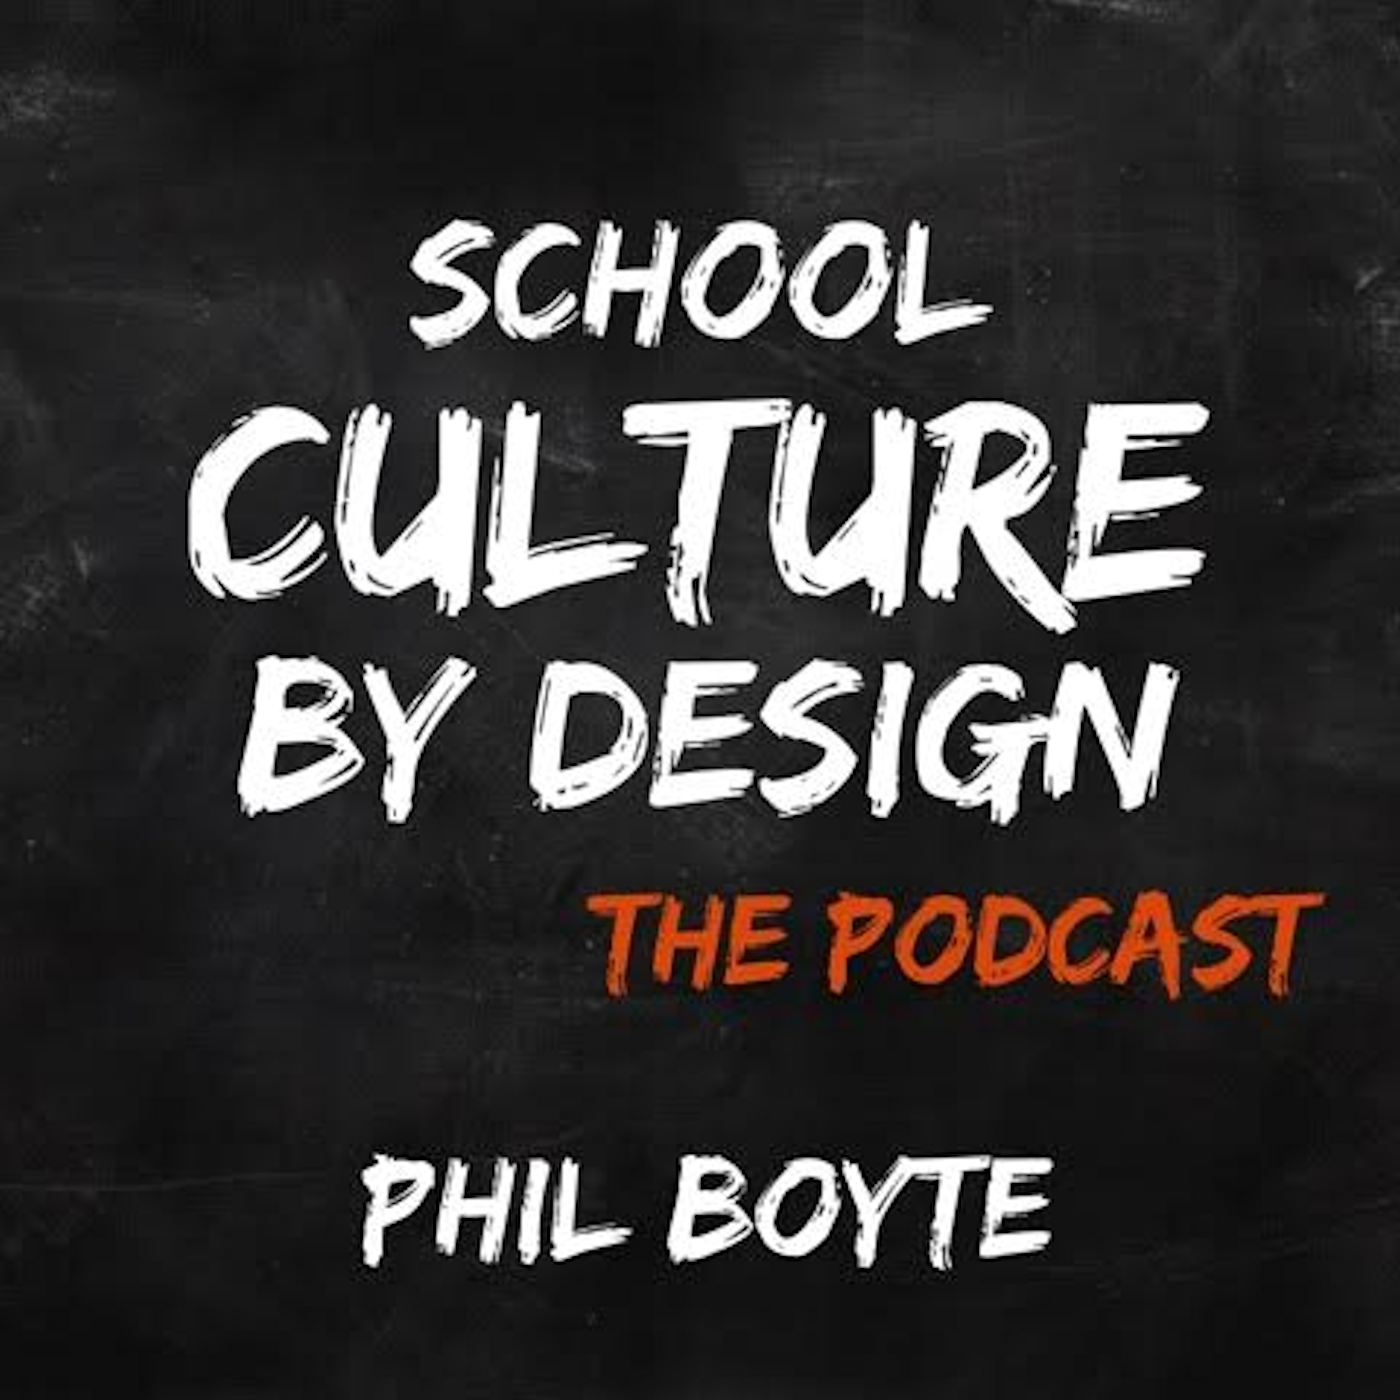 School Culture By Design show art